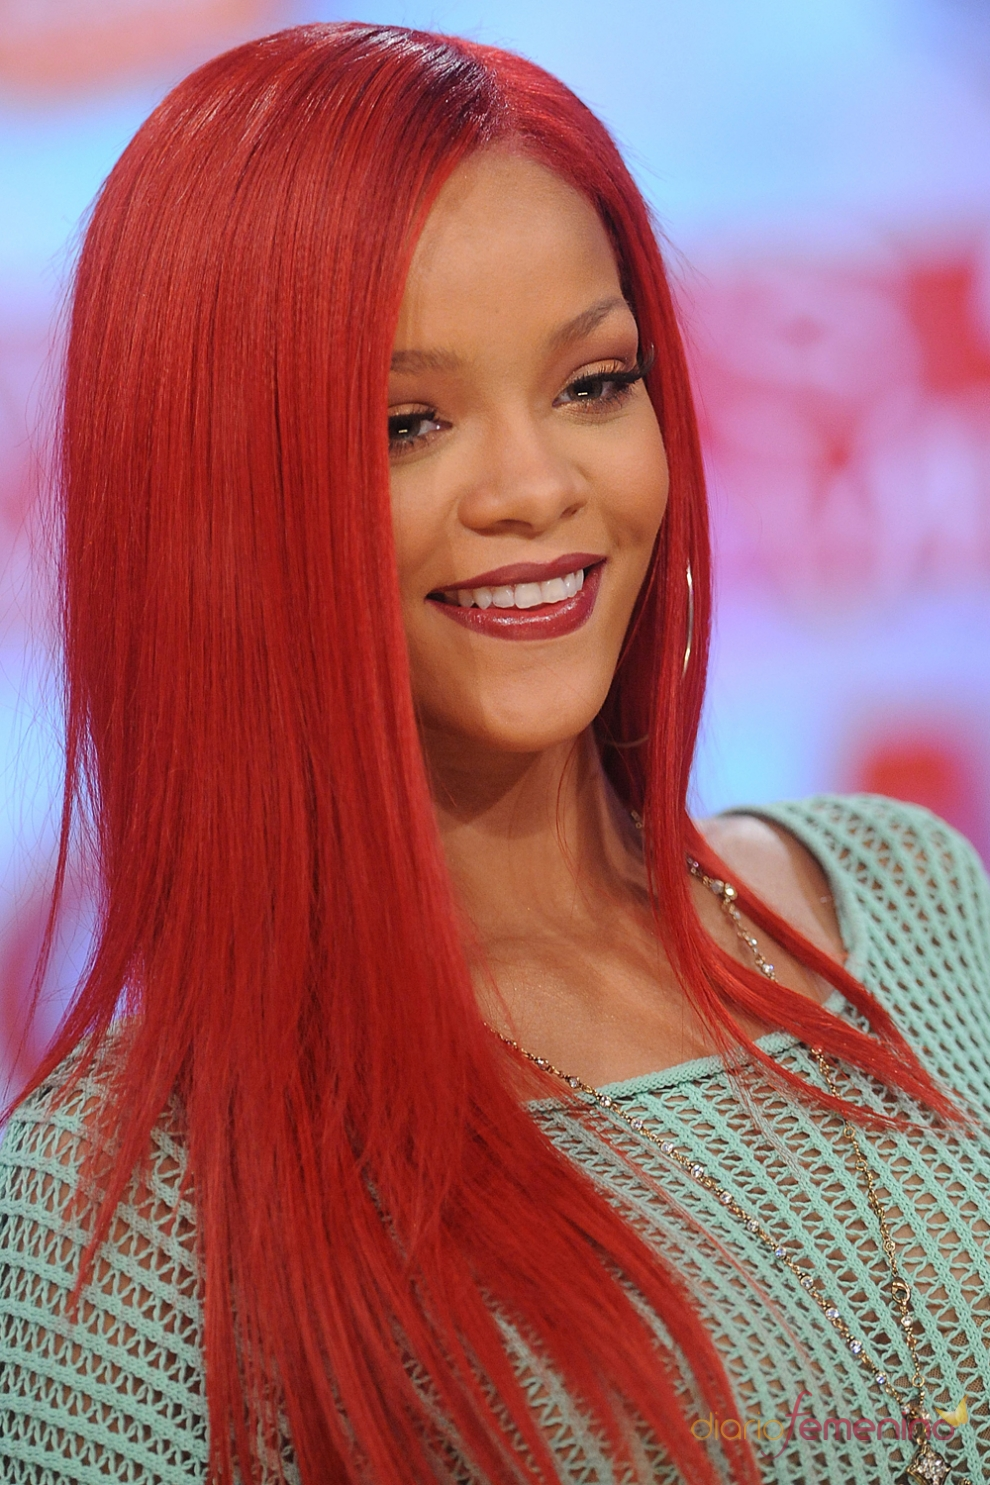 Pelo de colores rihanna rojo sirenita - Bano de color rojo pelo ...